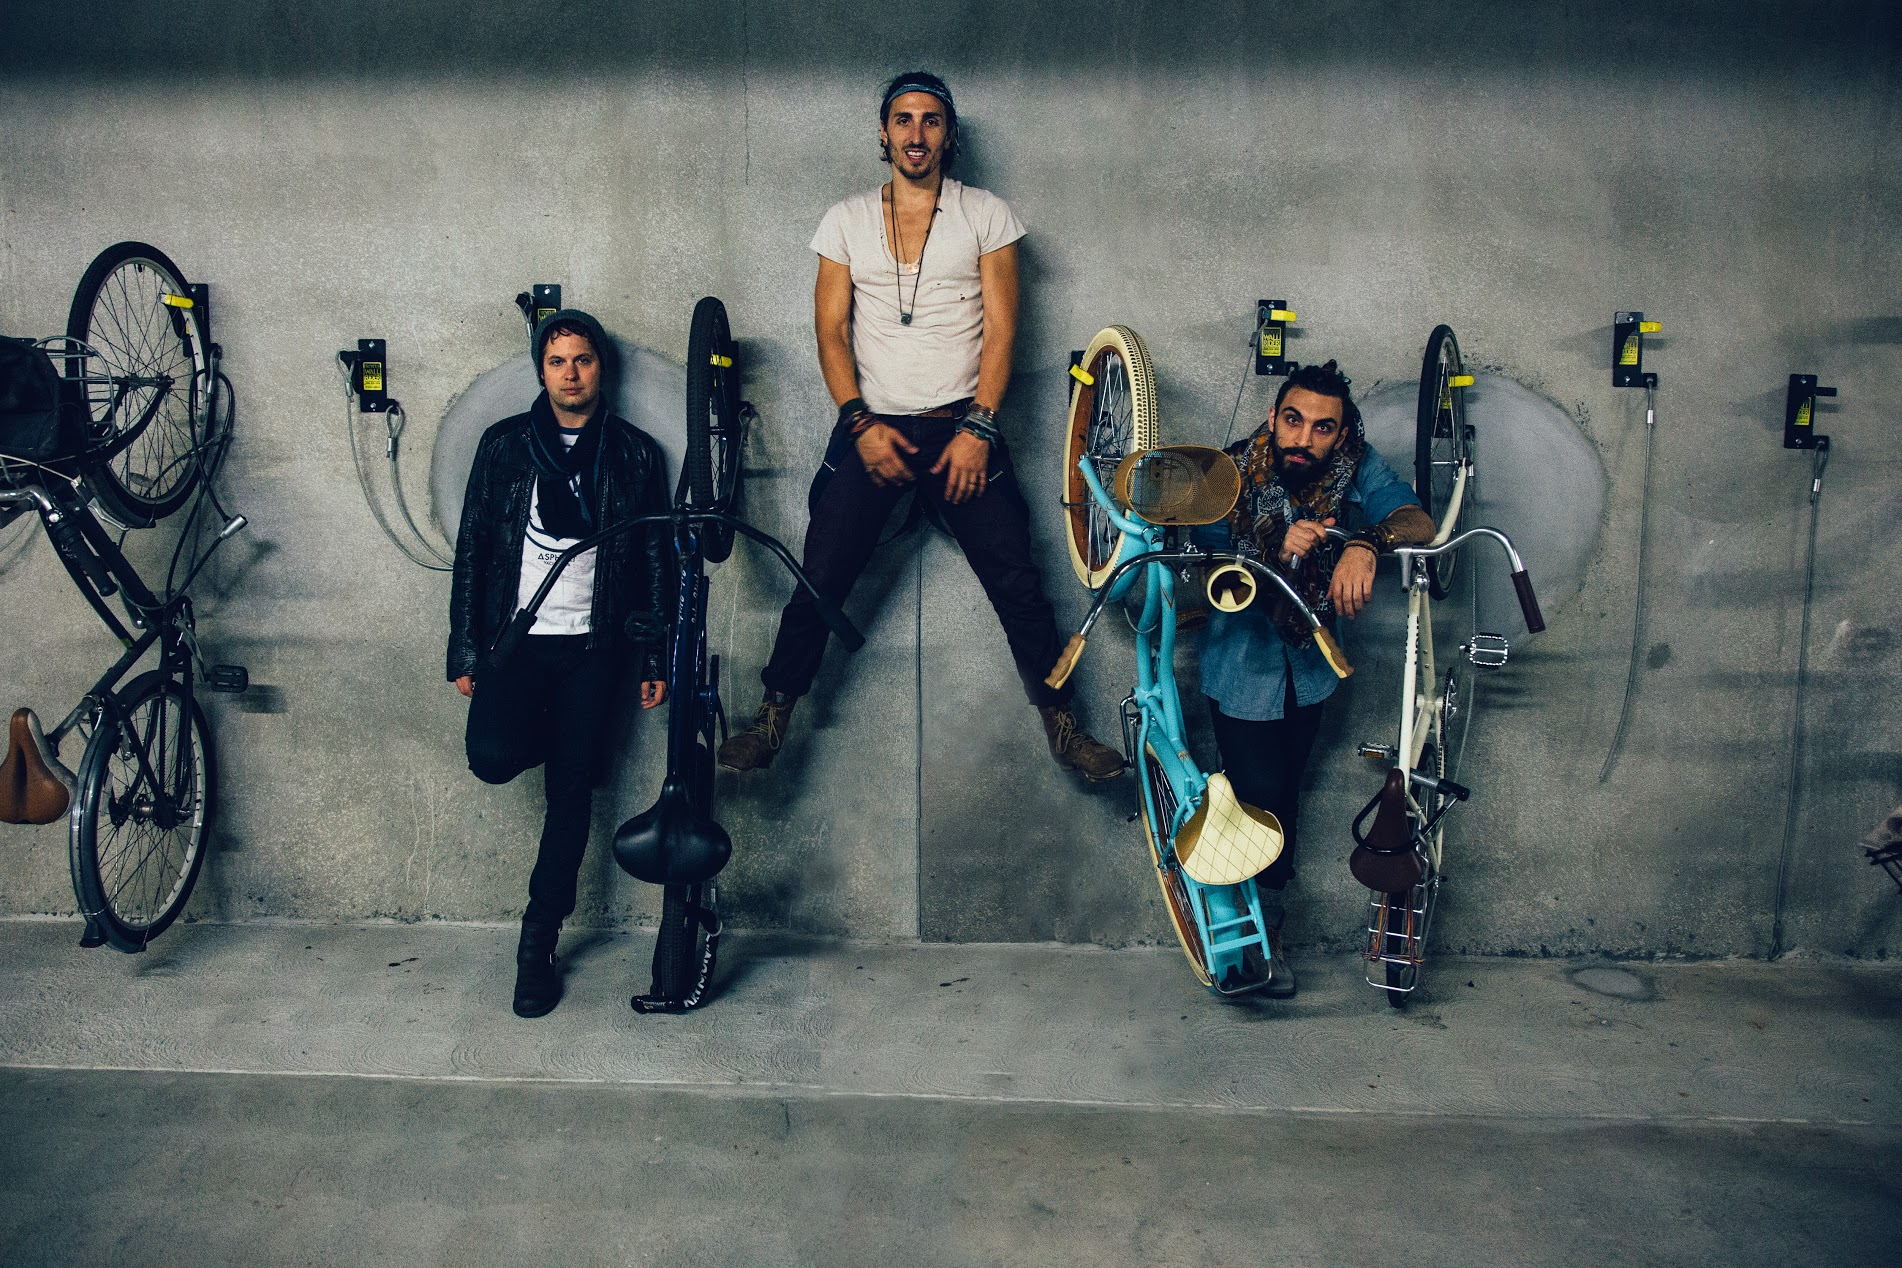 Bike Rack Trio